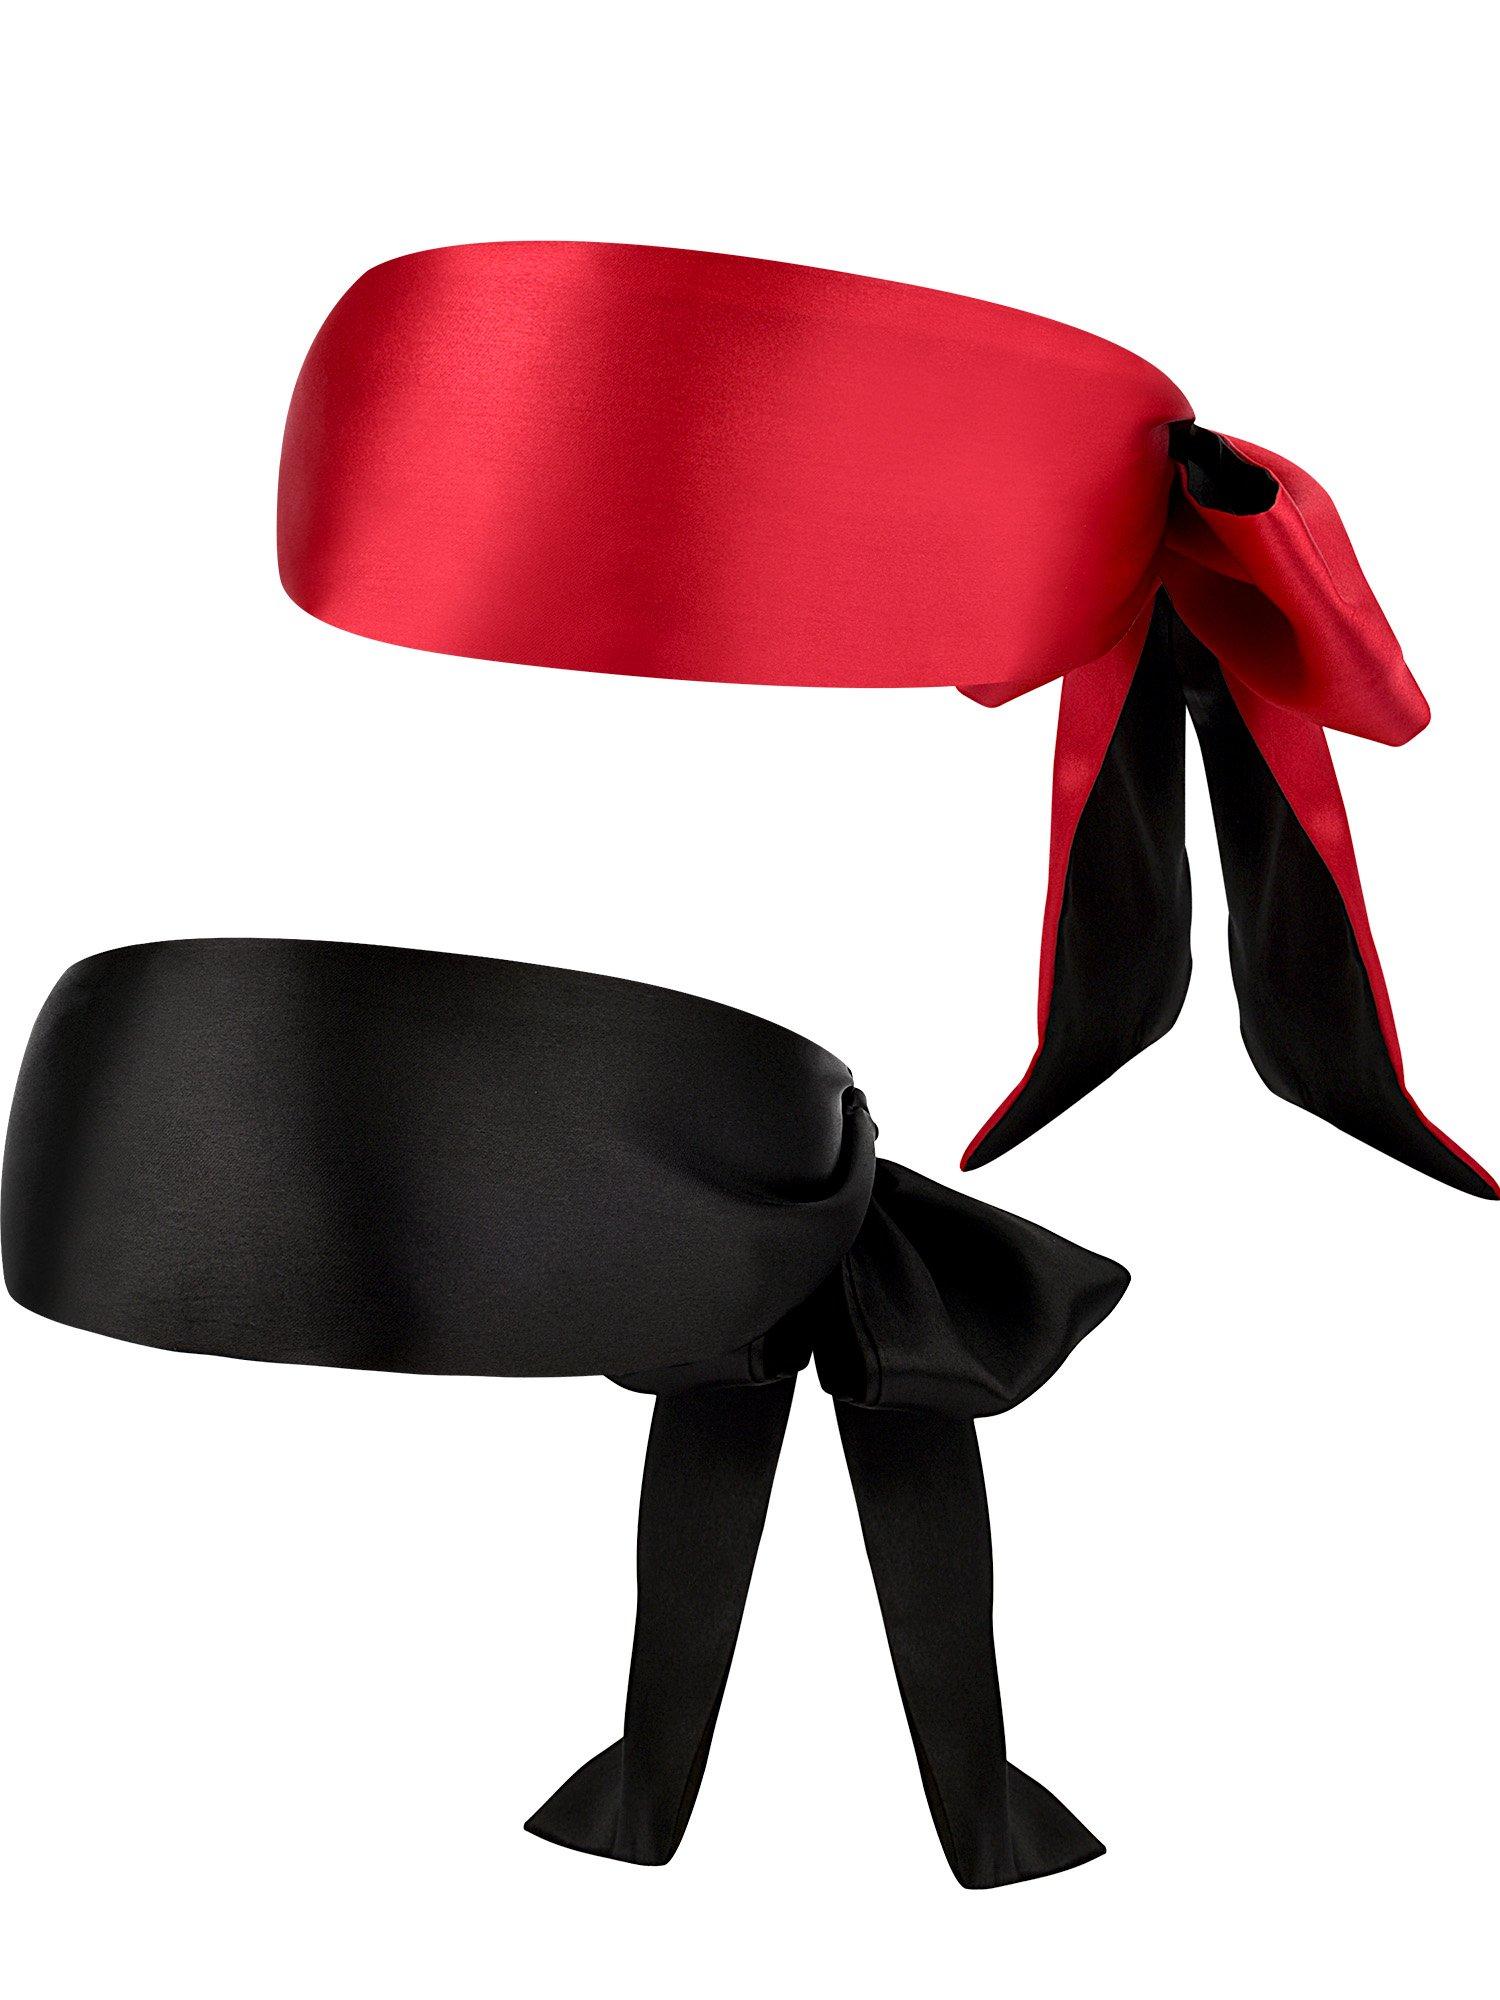 2 Pieces 1.5 Meters Satin Eye Mask Sleeping Ribbon Blindfold Costume Satin Eye Shades, 2 Colors